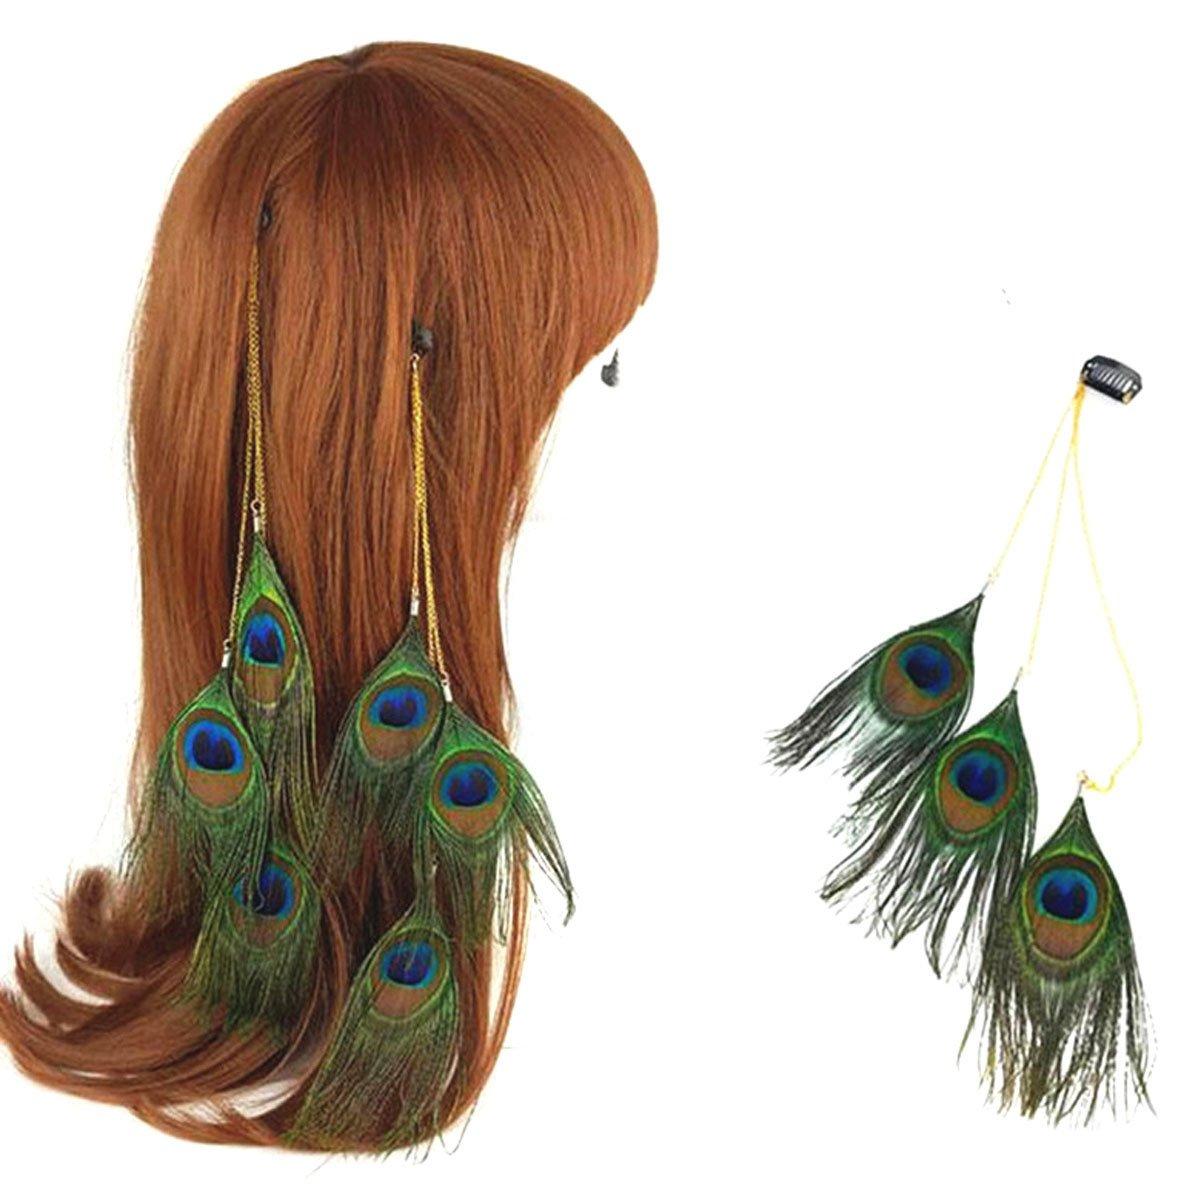 3 Pcs Women Lady Girls Handmade Bohemian Style Folk-custom Peacock Feather Hair Extensions Clip Comb Ornaments Tassel - Fashion BOHO Hairband Hippie Headdress Headband for DIY Accessories Hairpin Numblartd